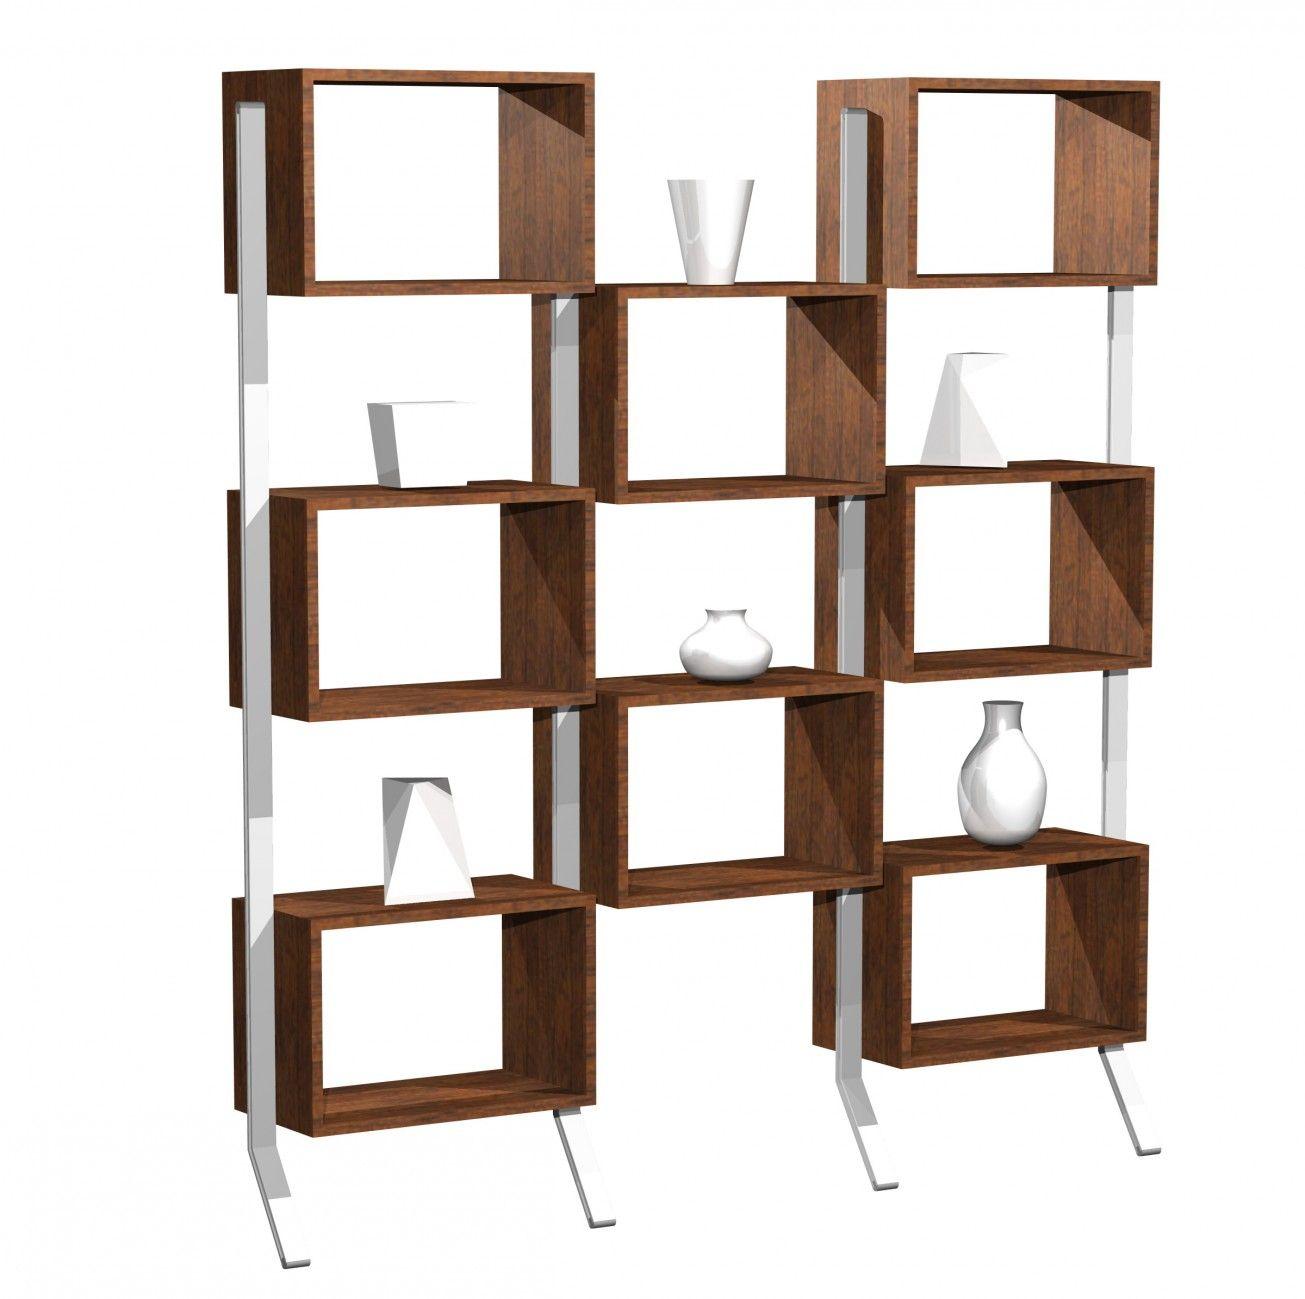 Remarkable Modular Shelving Units Design : Terrific Shelves ...